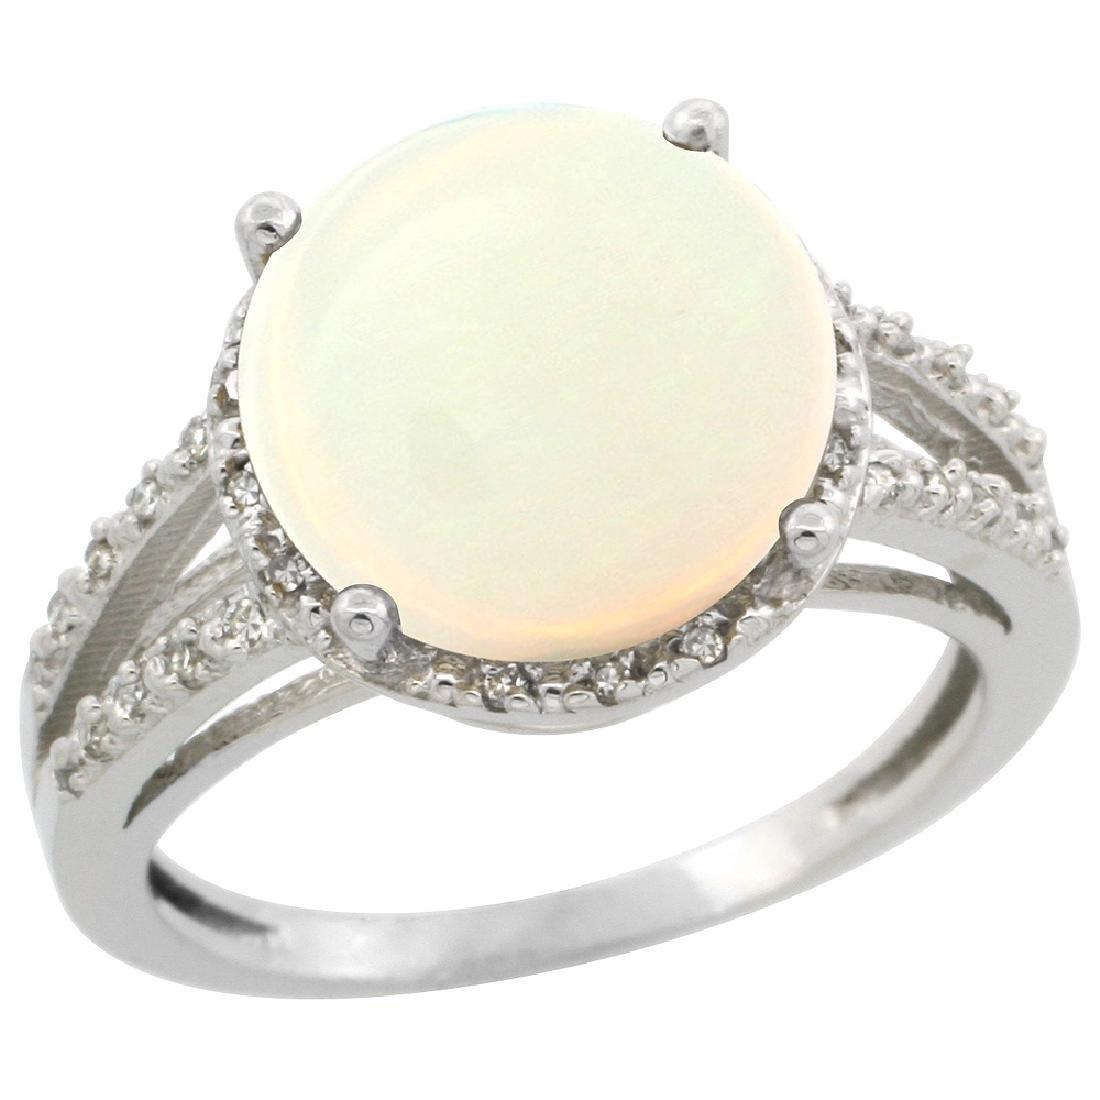 Natural 5.34 ctw Opal & Diamond Engagement Ring 14K